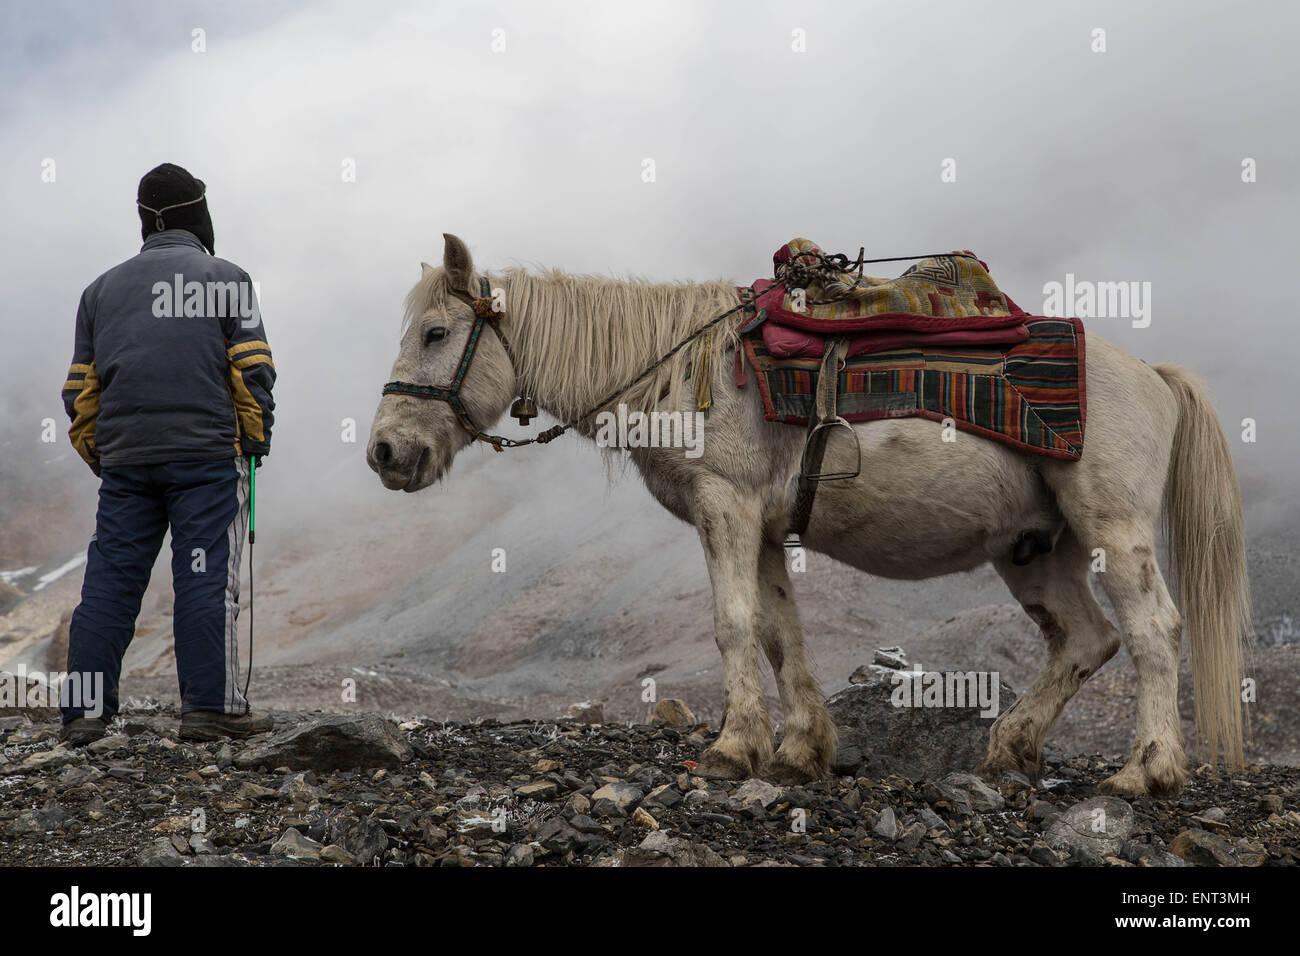 Horse and Horse Man, Annapurna Circuit Trek, Nepal - Stock Image